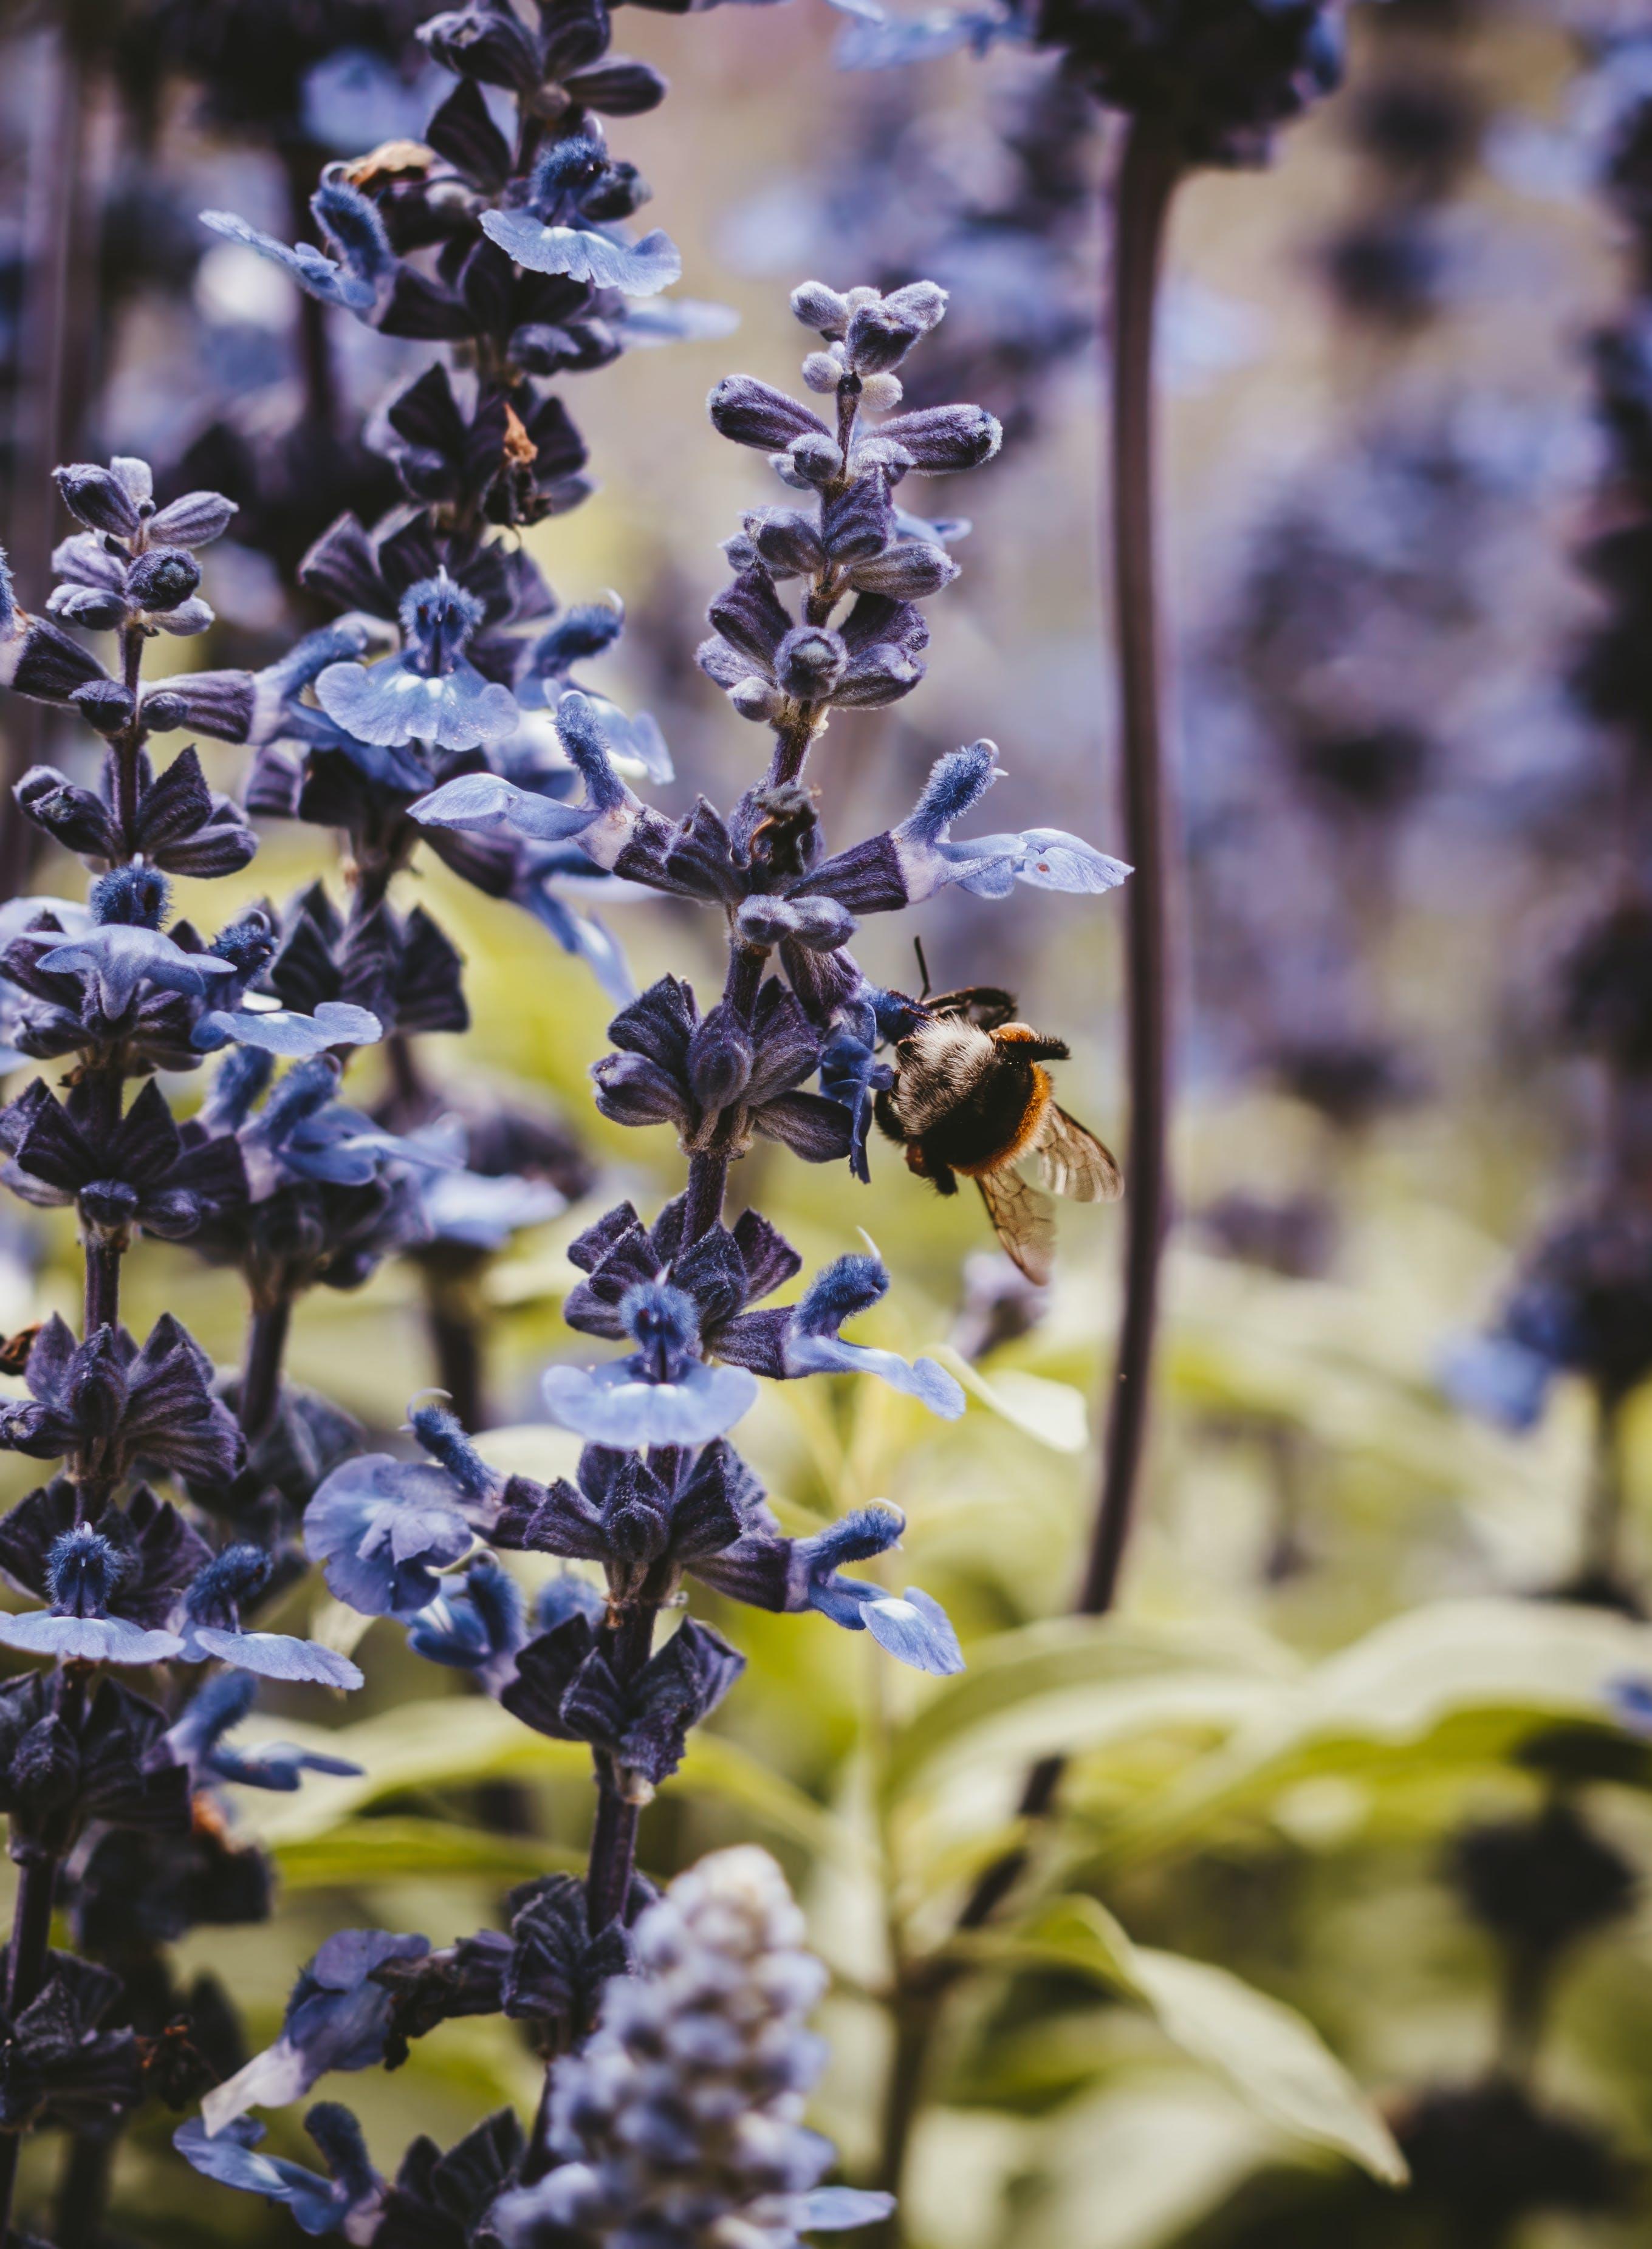 Fotos de stock gratuitas de aromático, flora, floración, flores